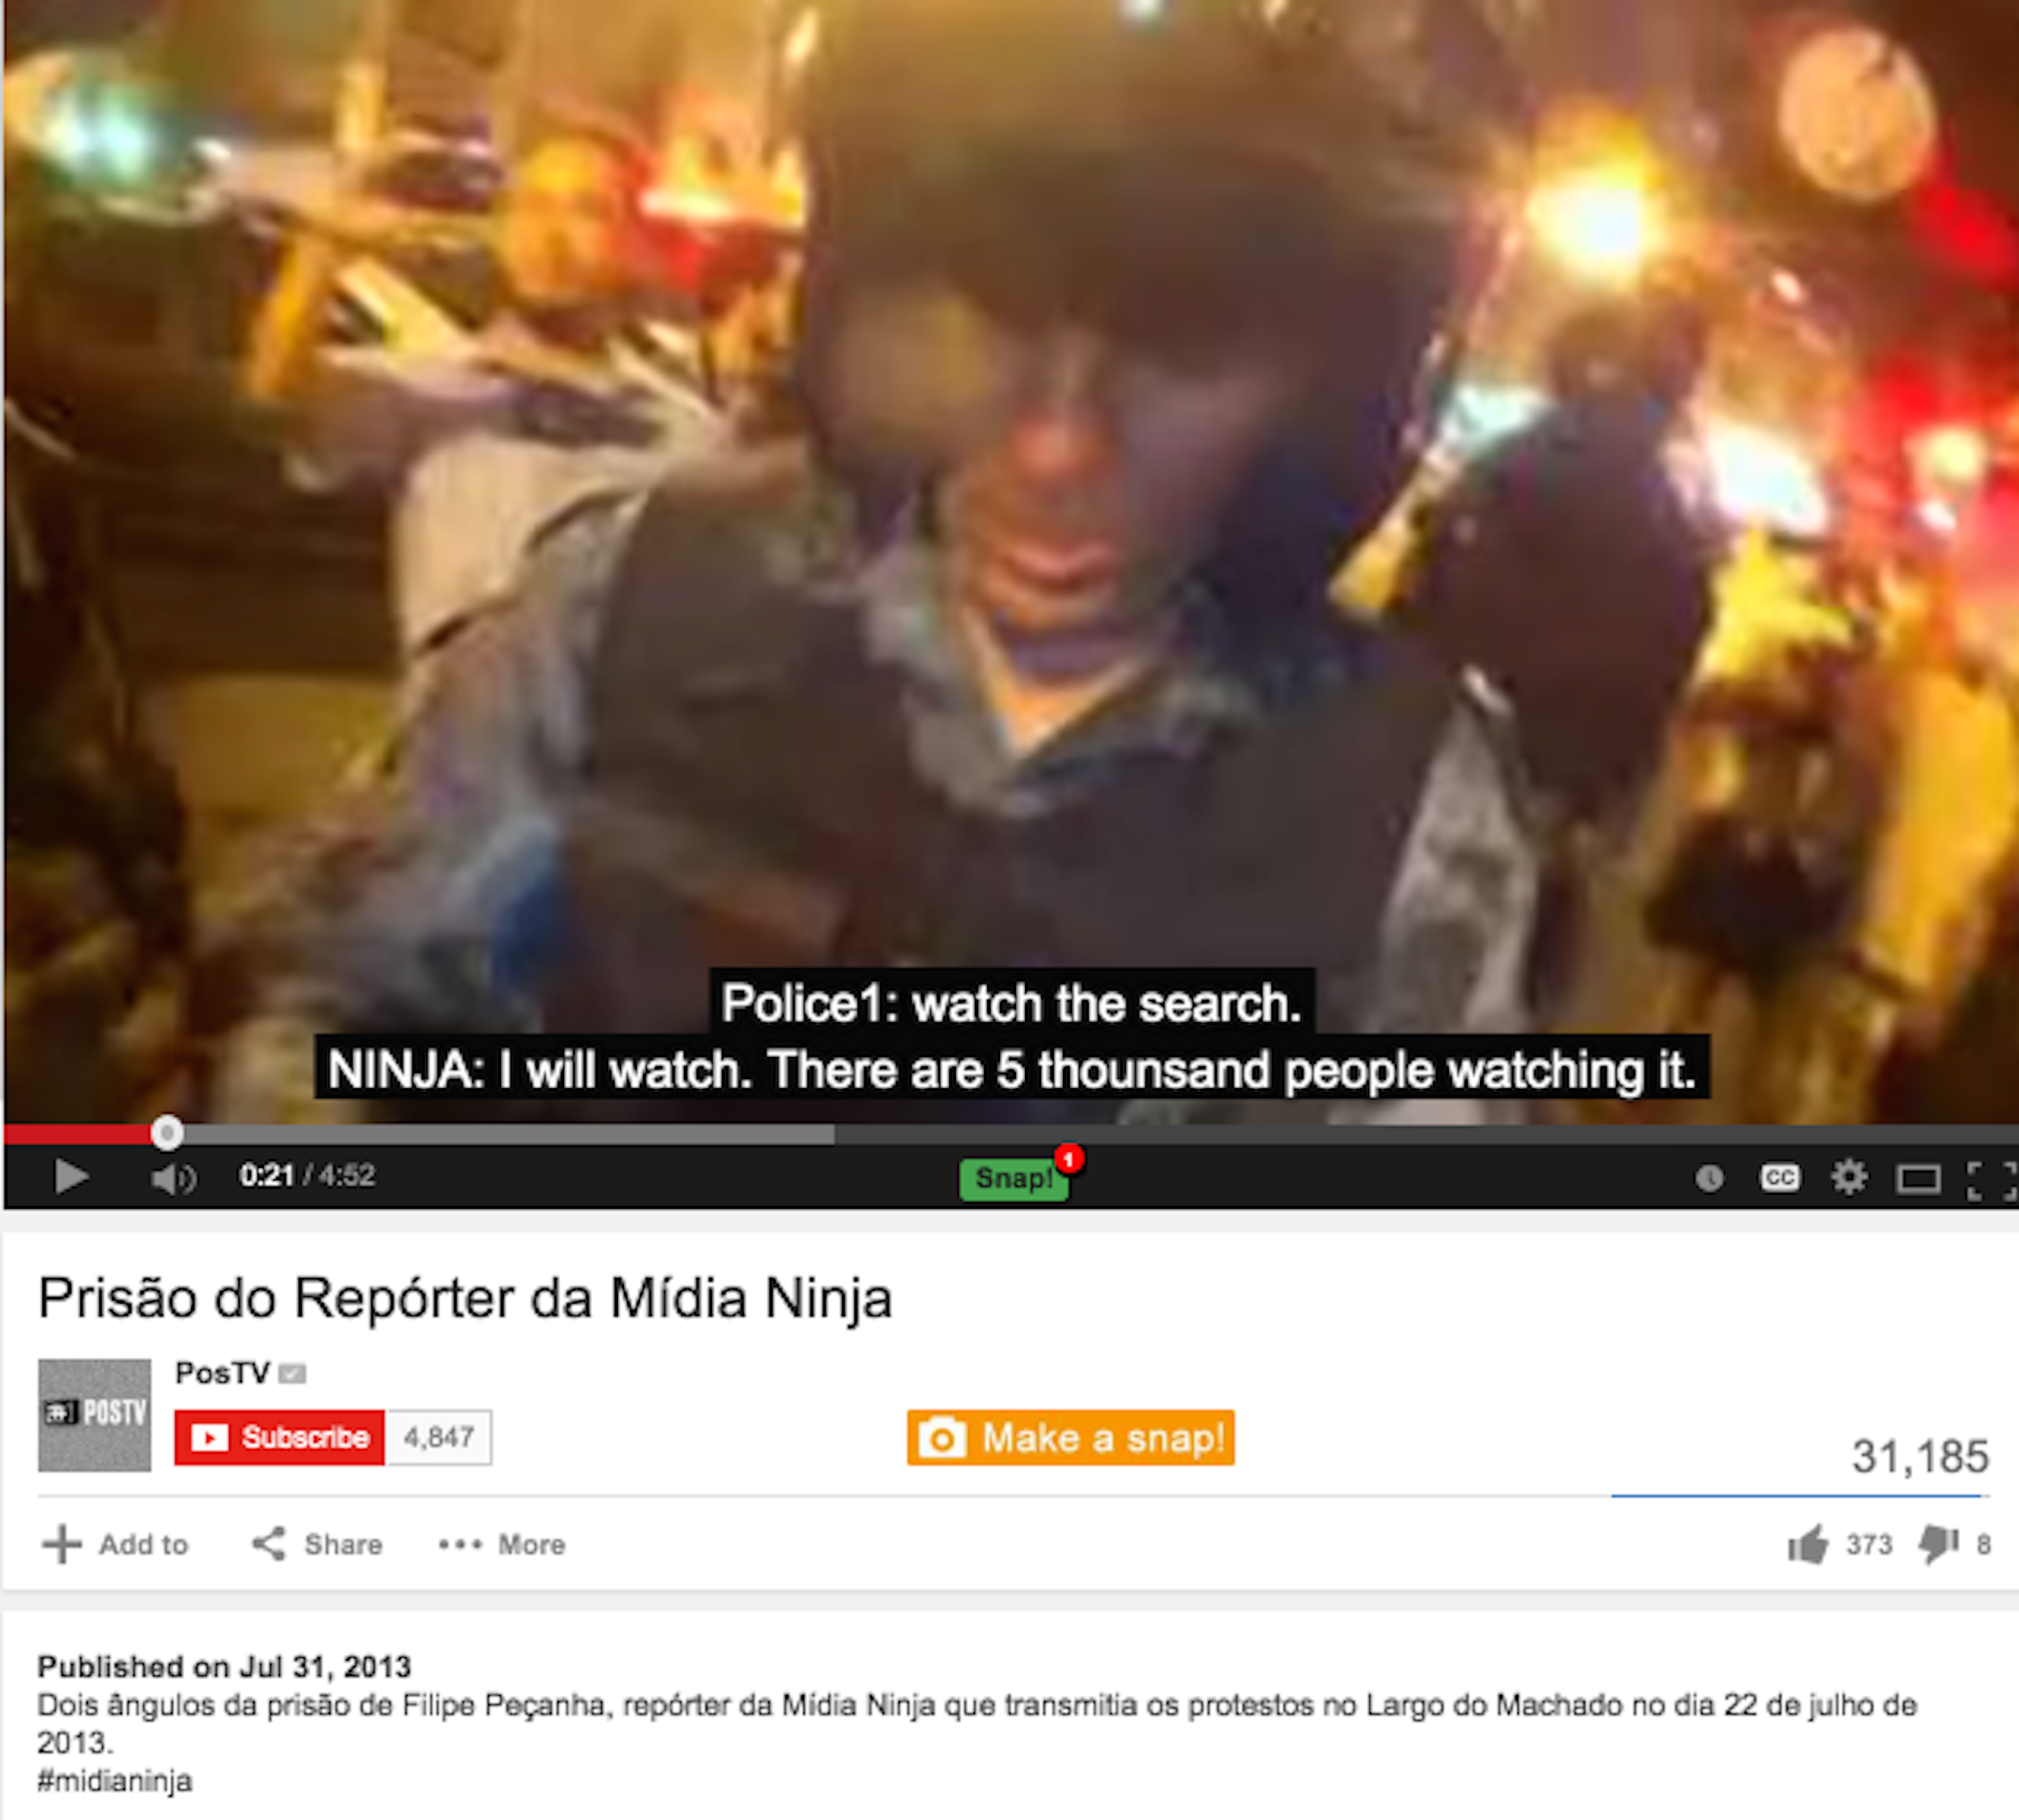 Figure3_FilipeC_Livestreamed arrest in Brazil, 2013